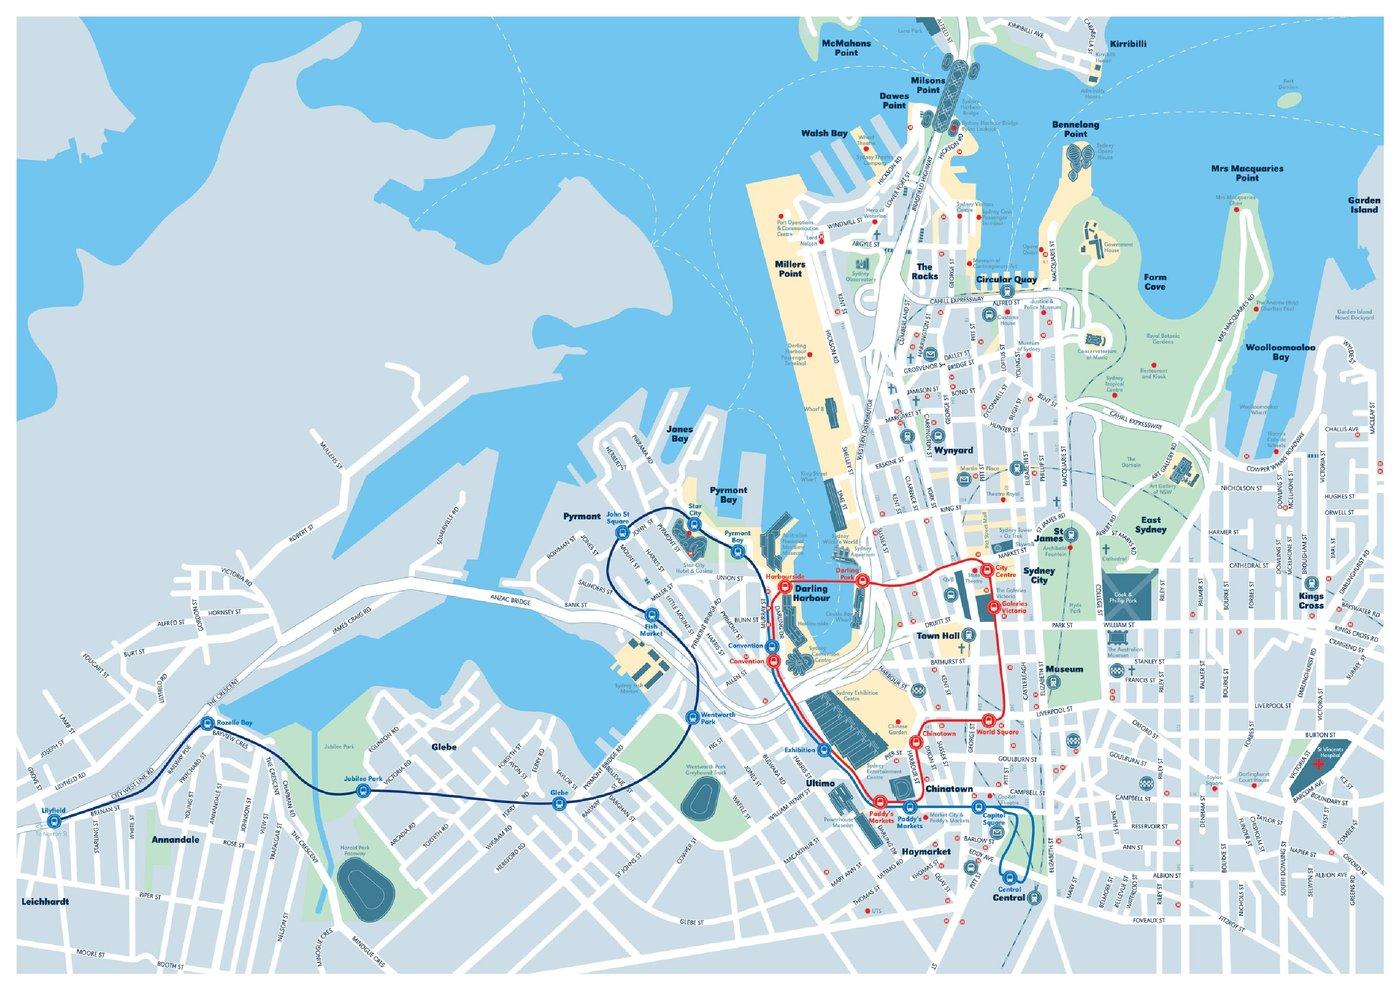 sydney metro plan 2036600025 - photo#10